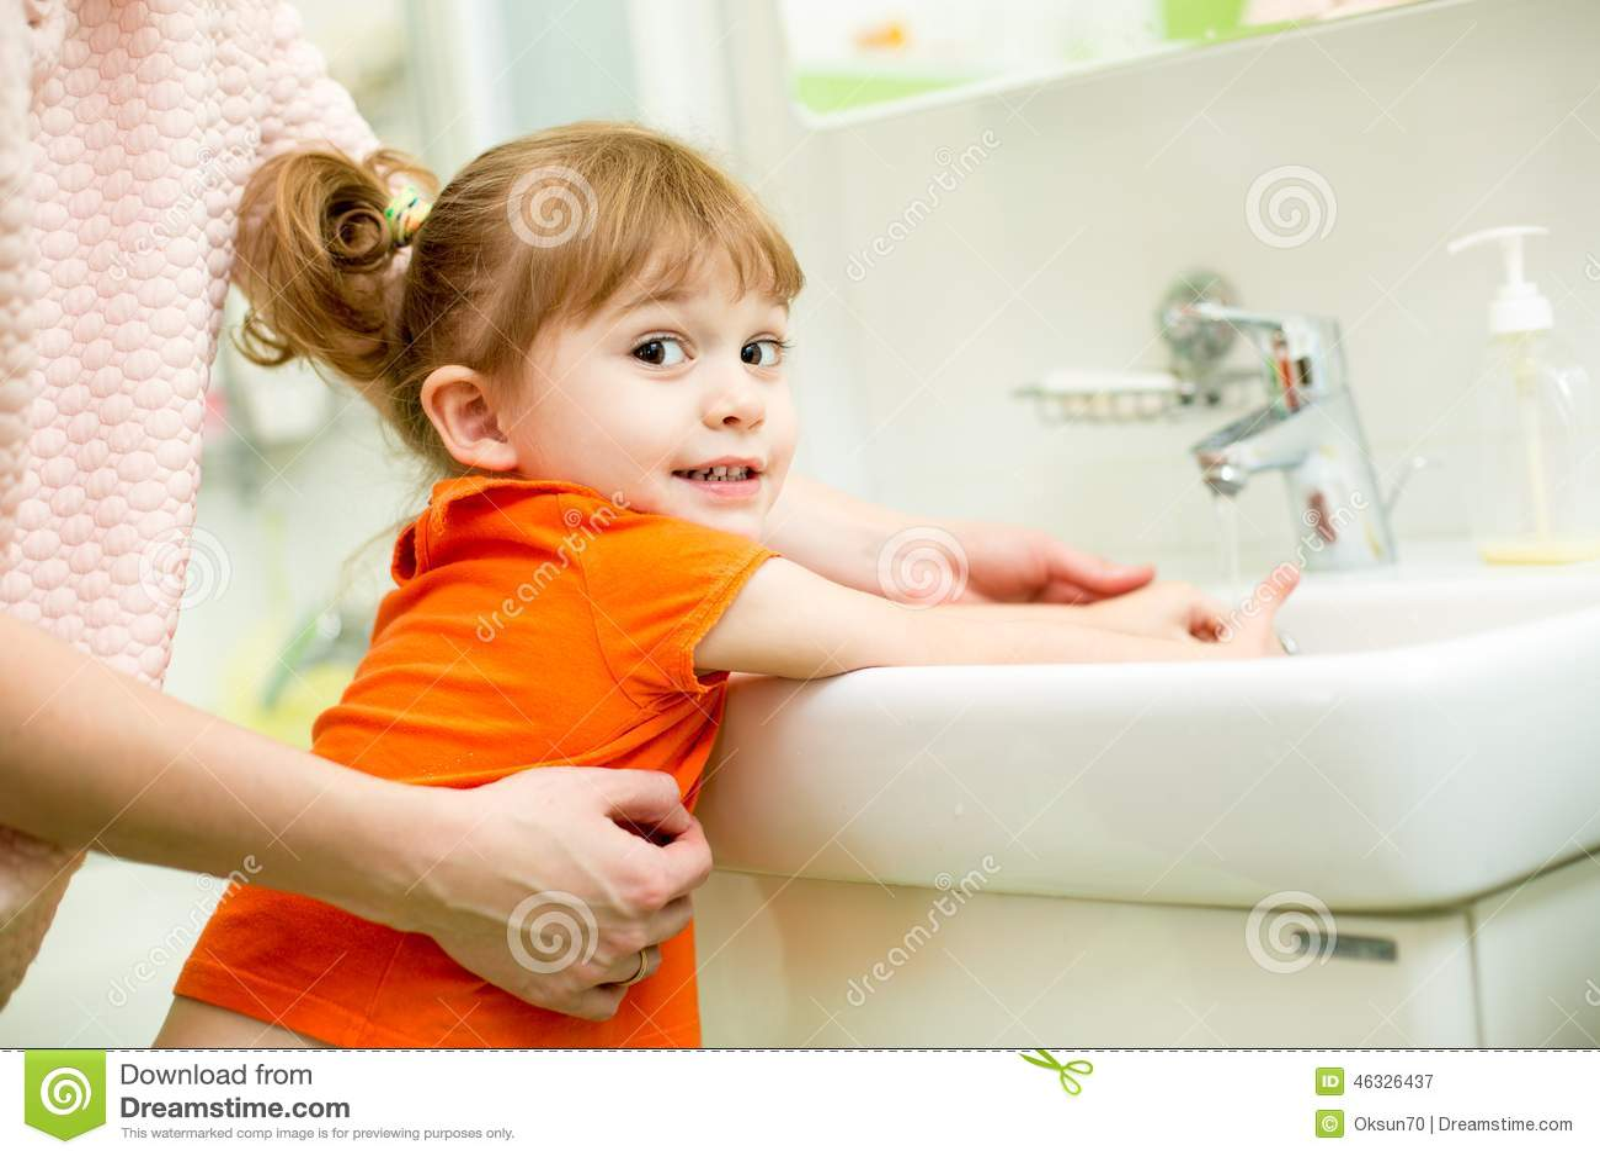 Kid Girl Washing Hands With Mom Help Stock Photo Image